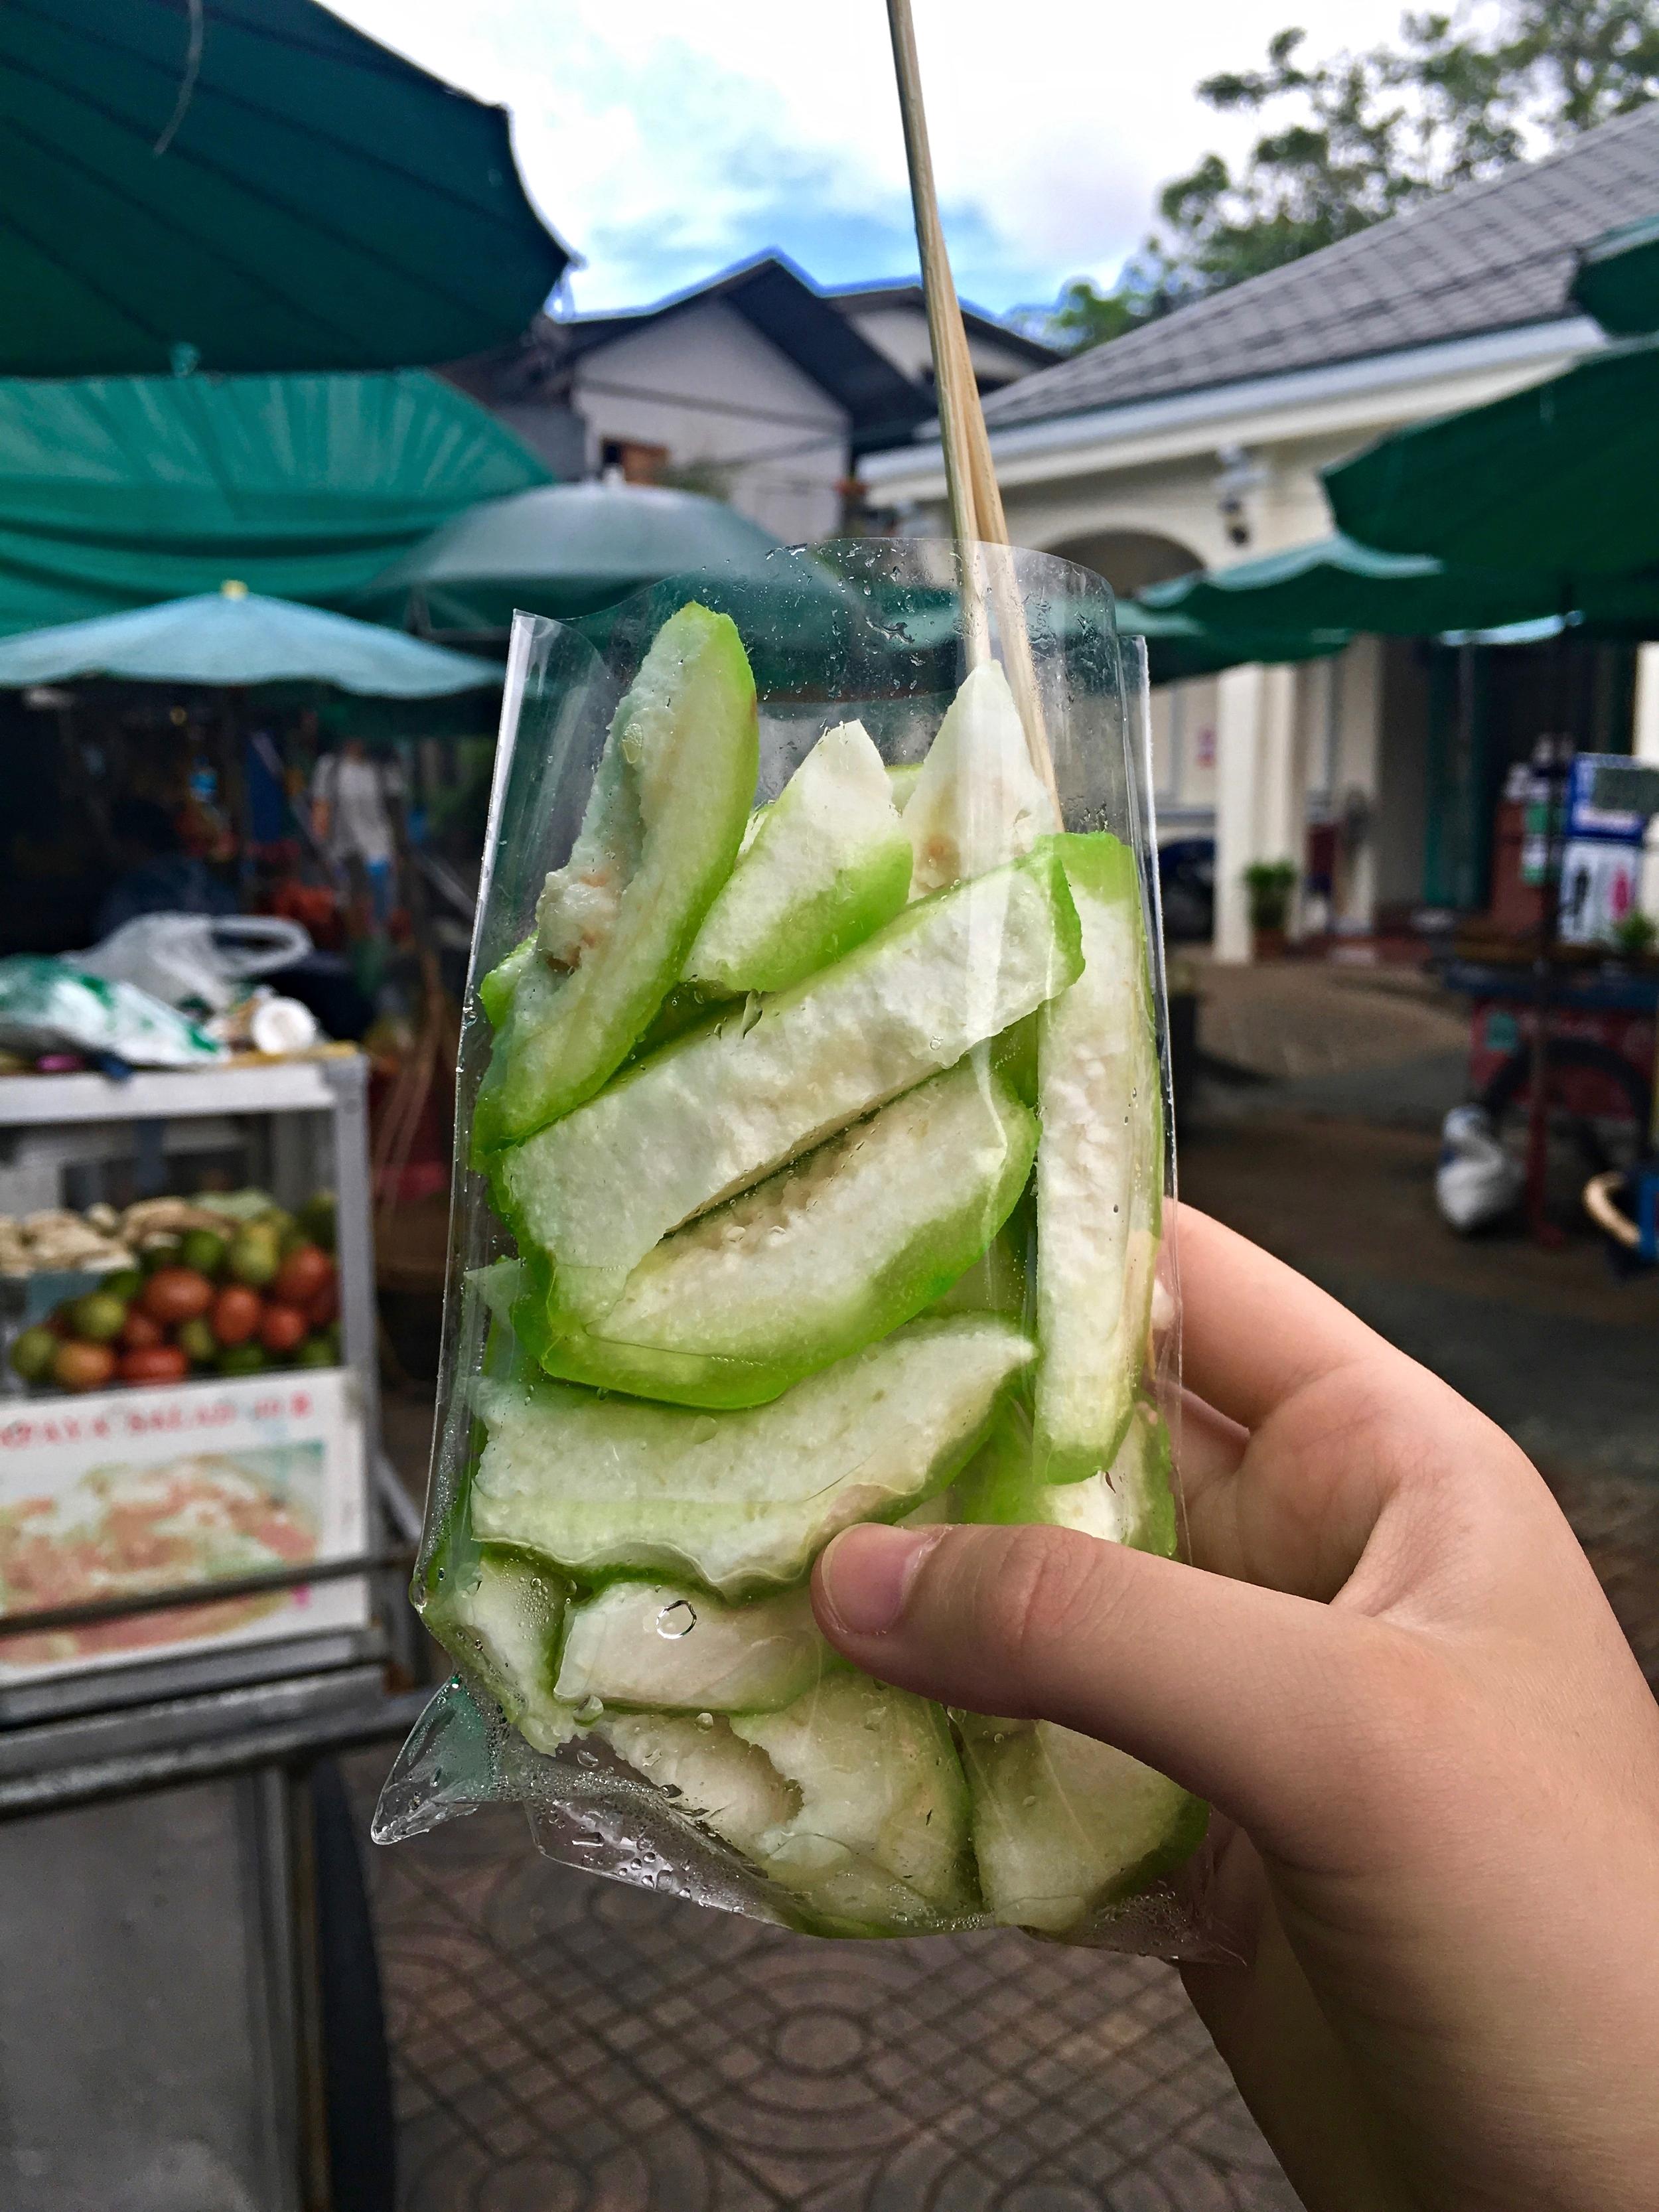 guava from street vendor.jpg